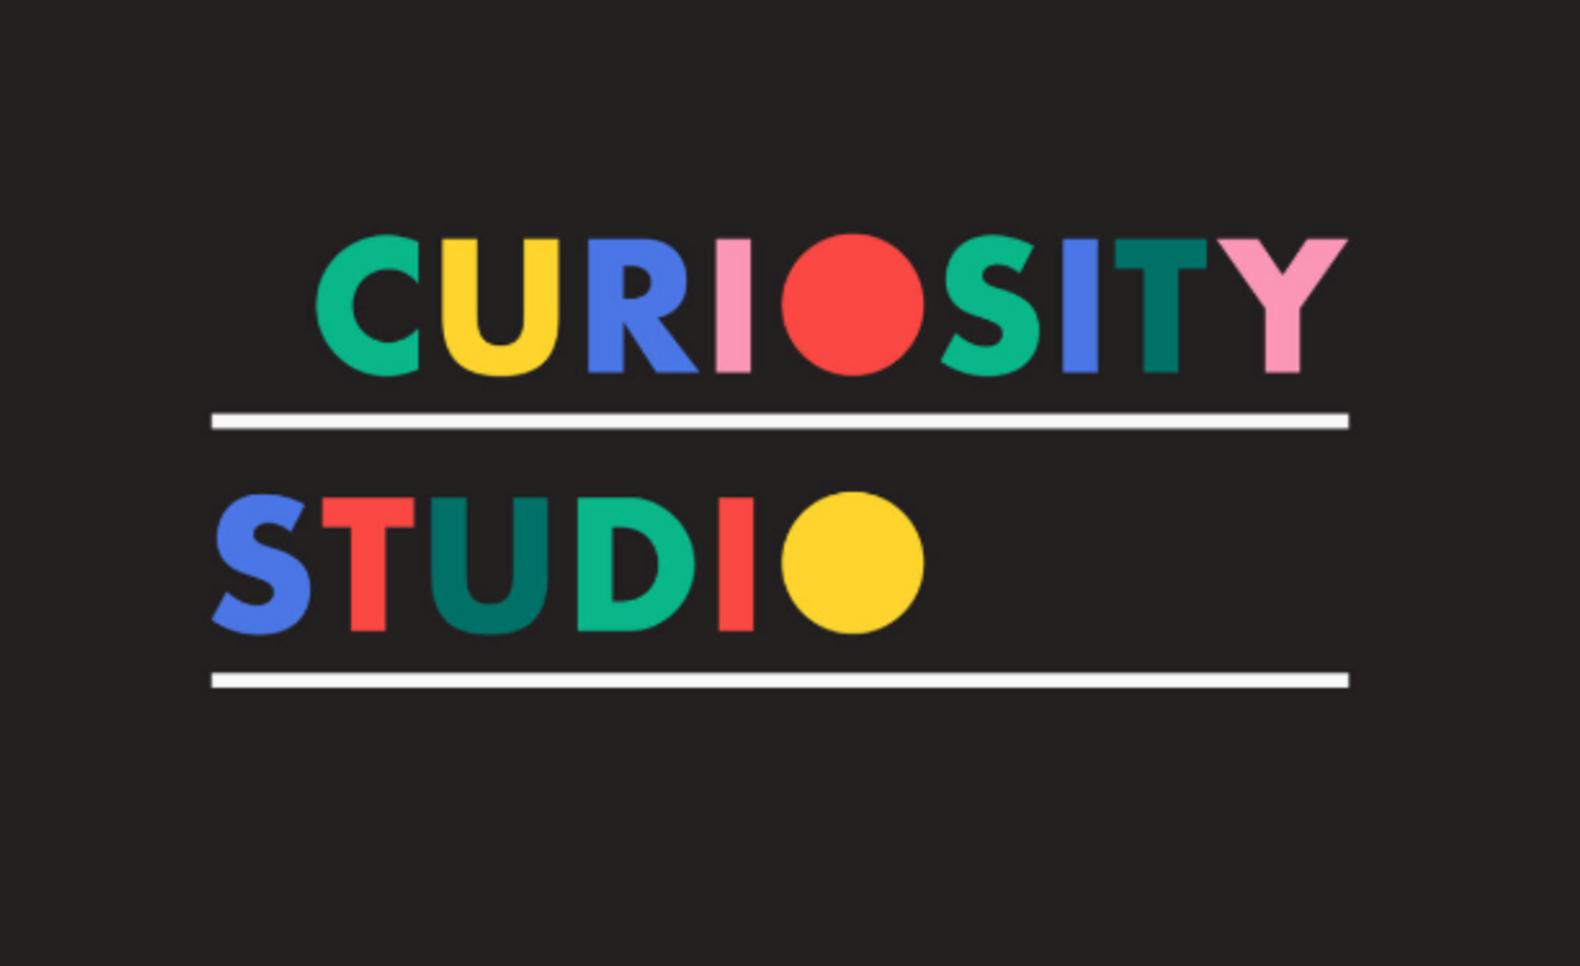 Curiosity Studio Presentation ; Ashley Mary